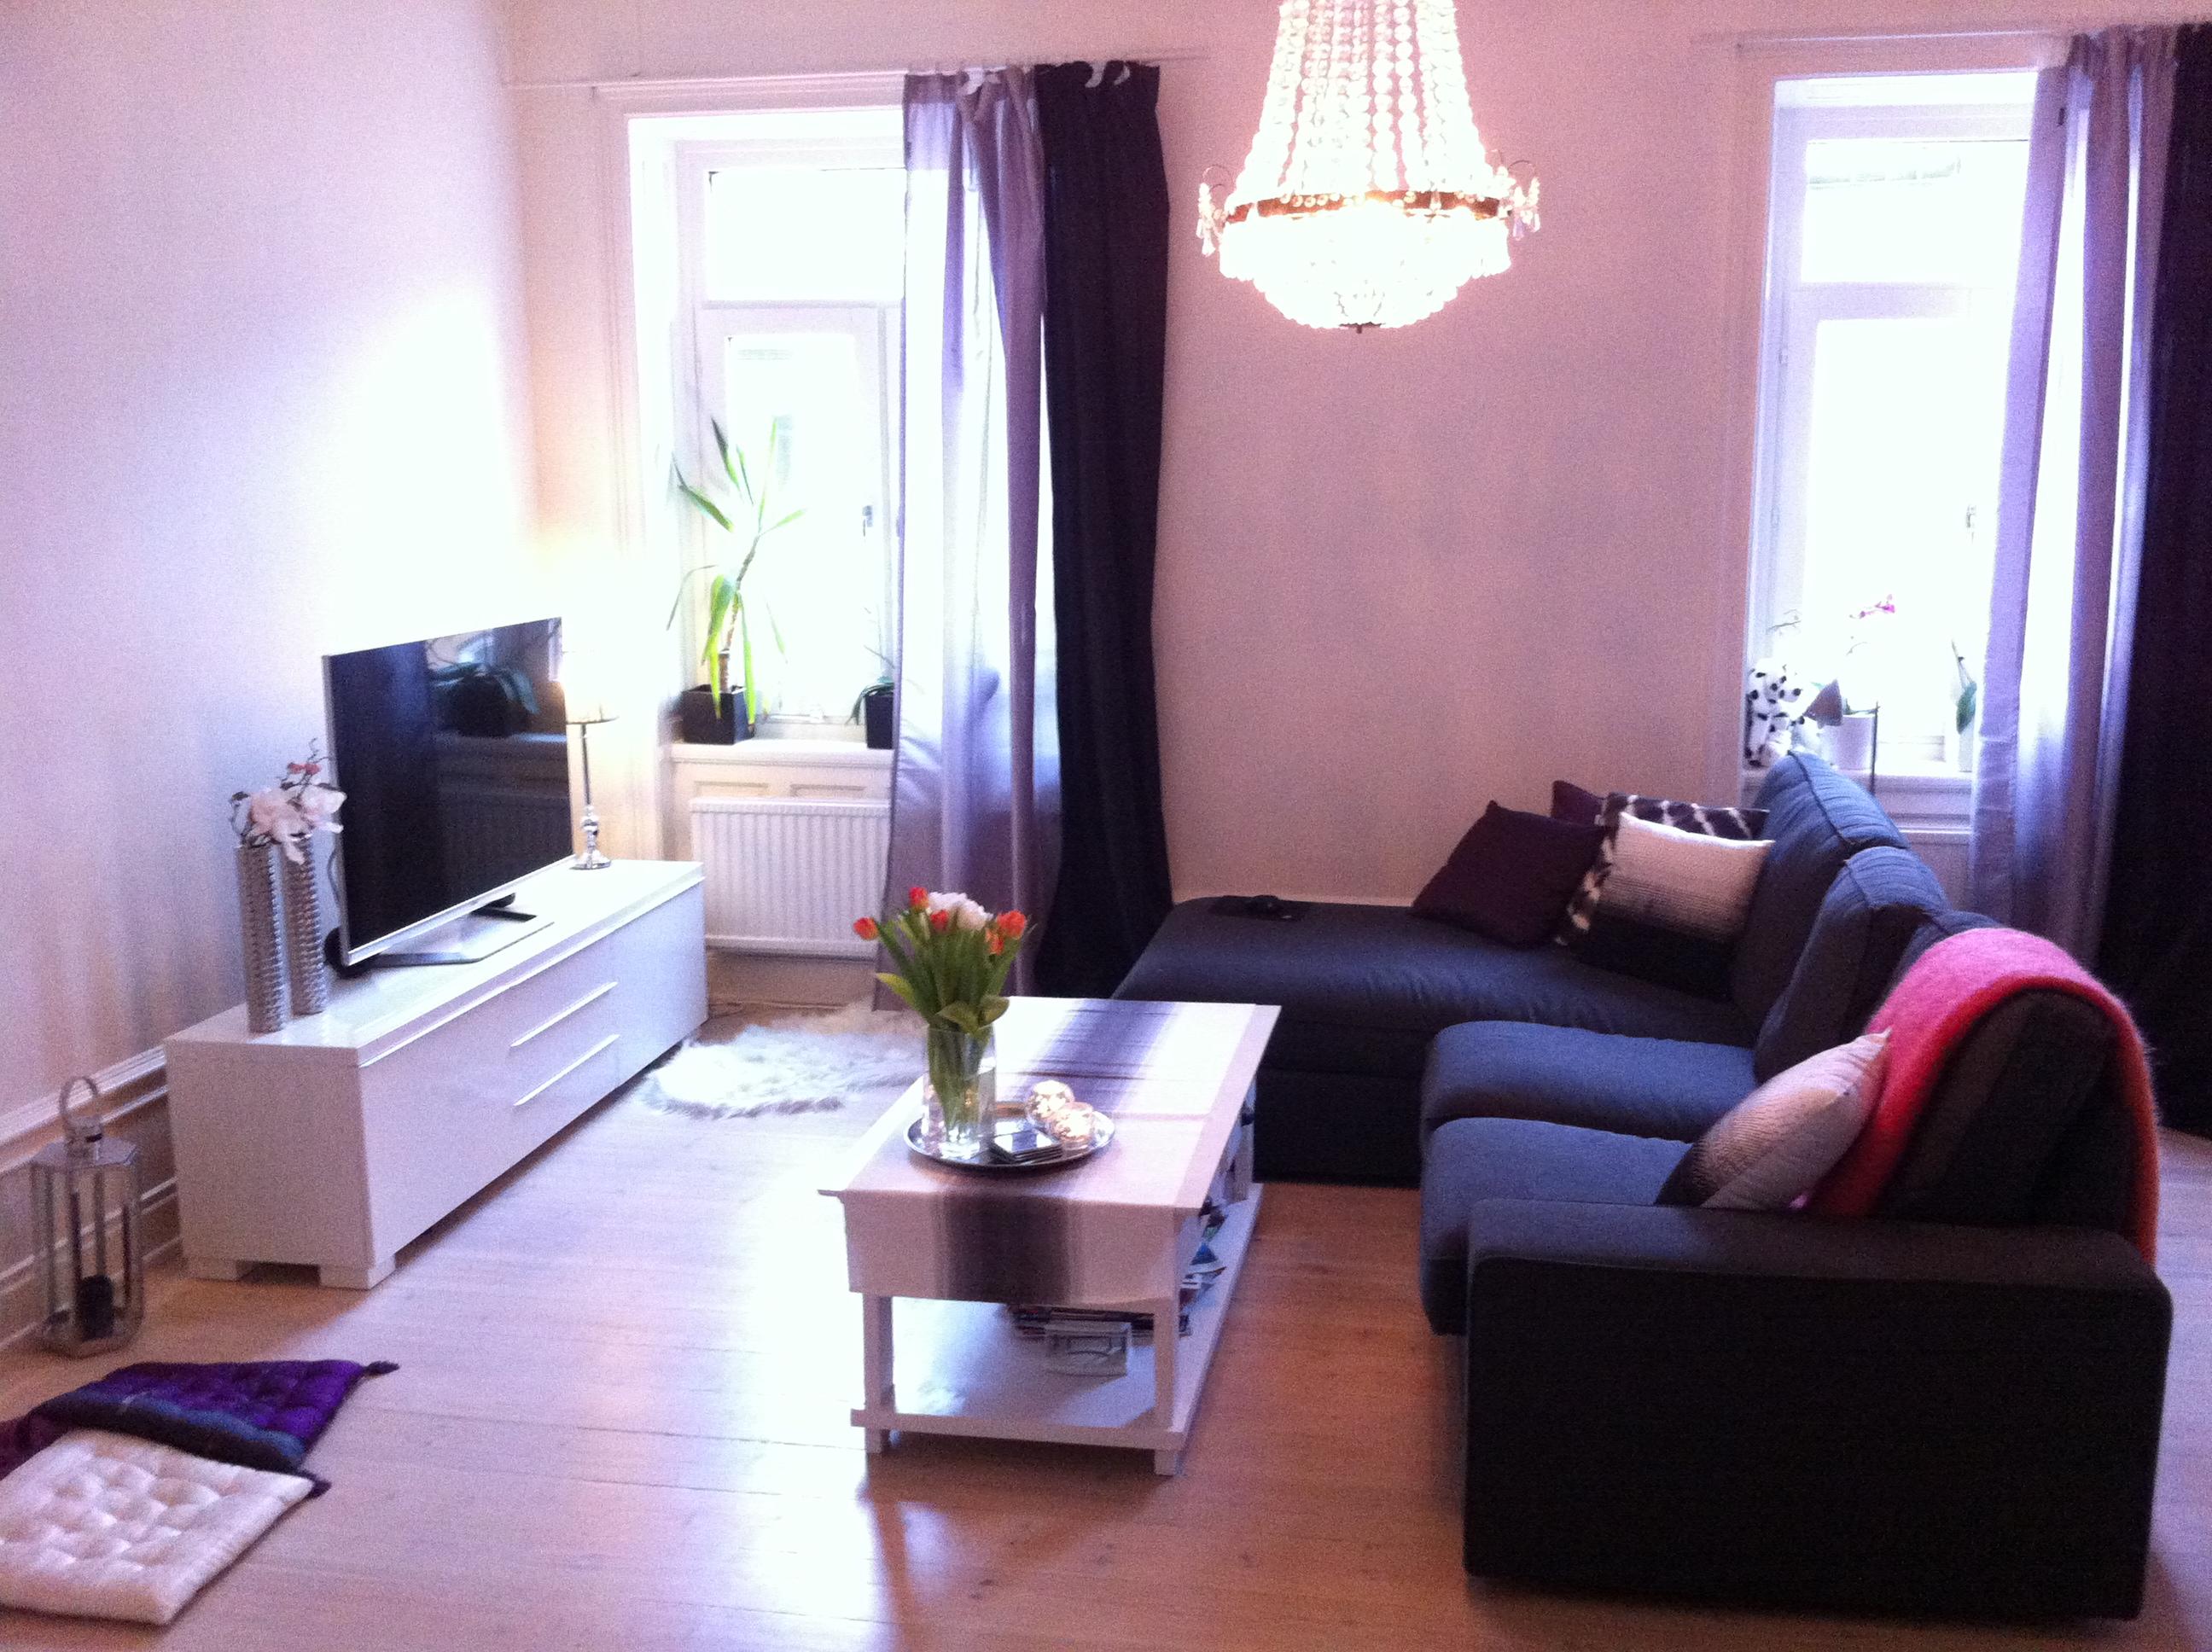 Inreda Kok Och Vardagsrum : Tips inreda vardagsrummet i orange forgkombination